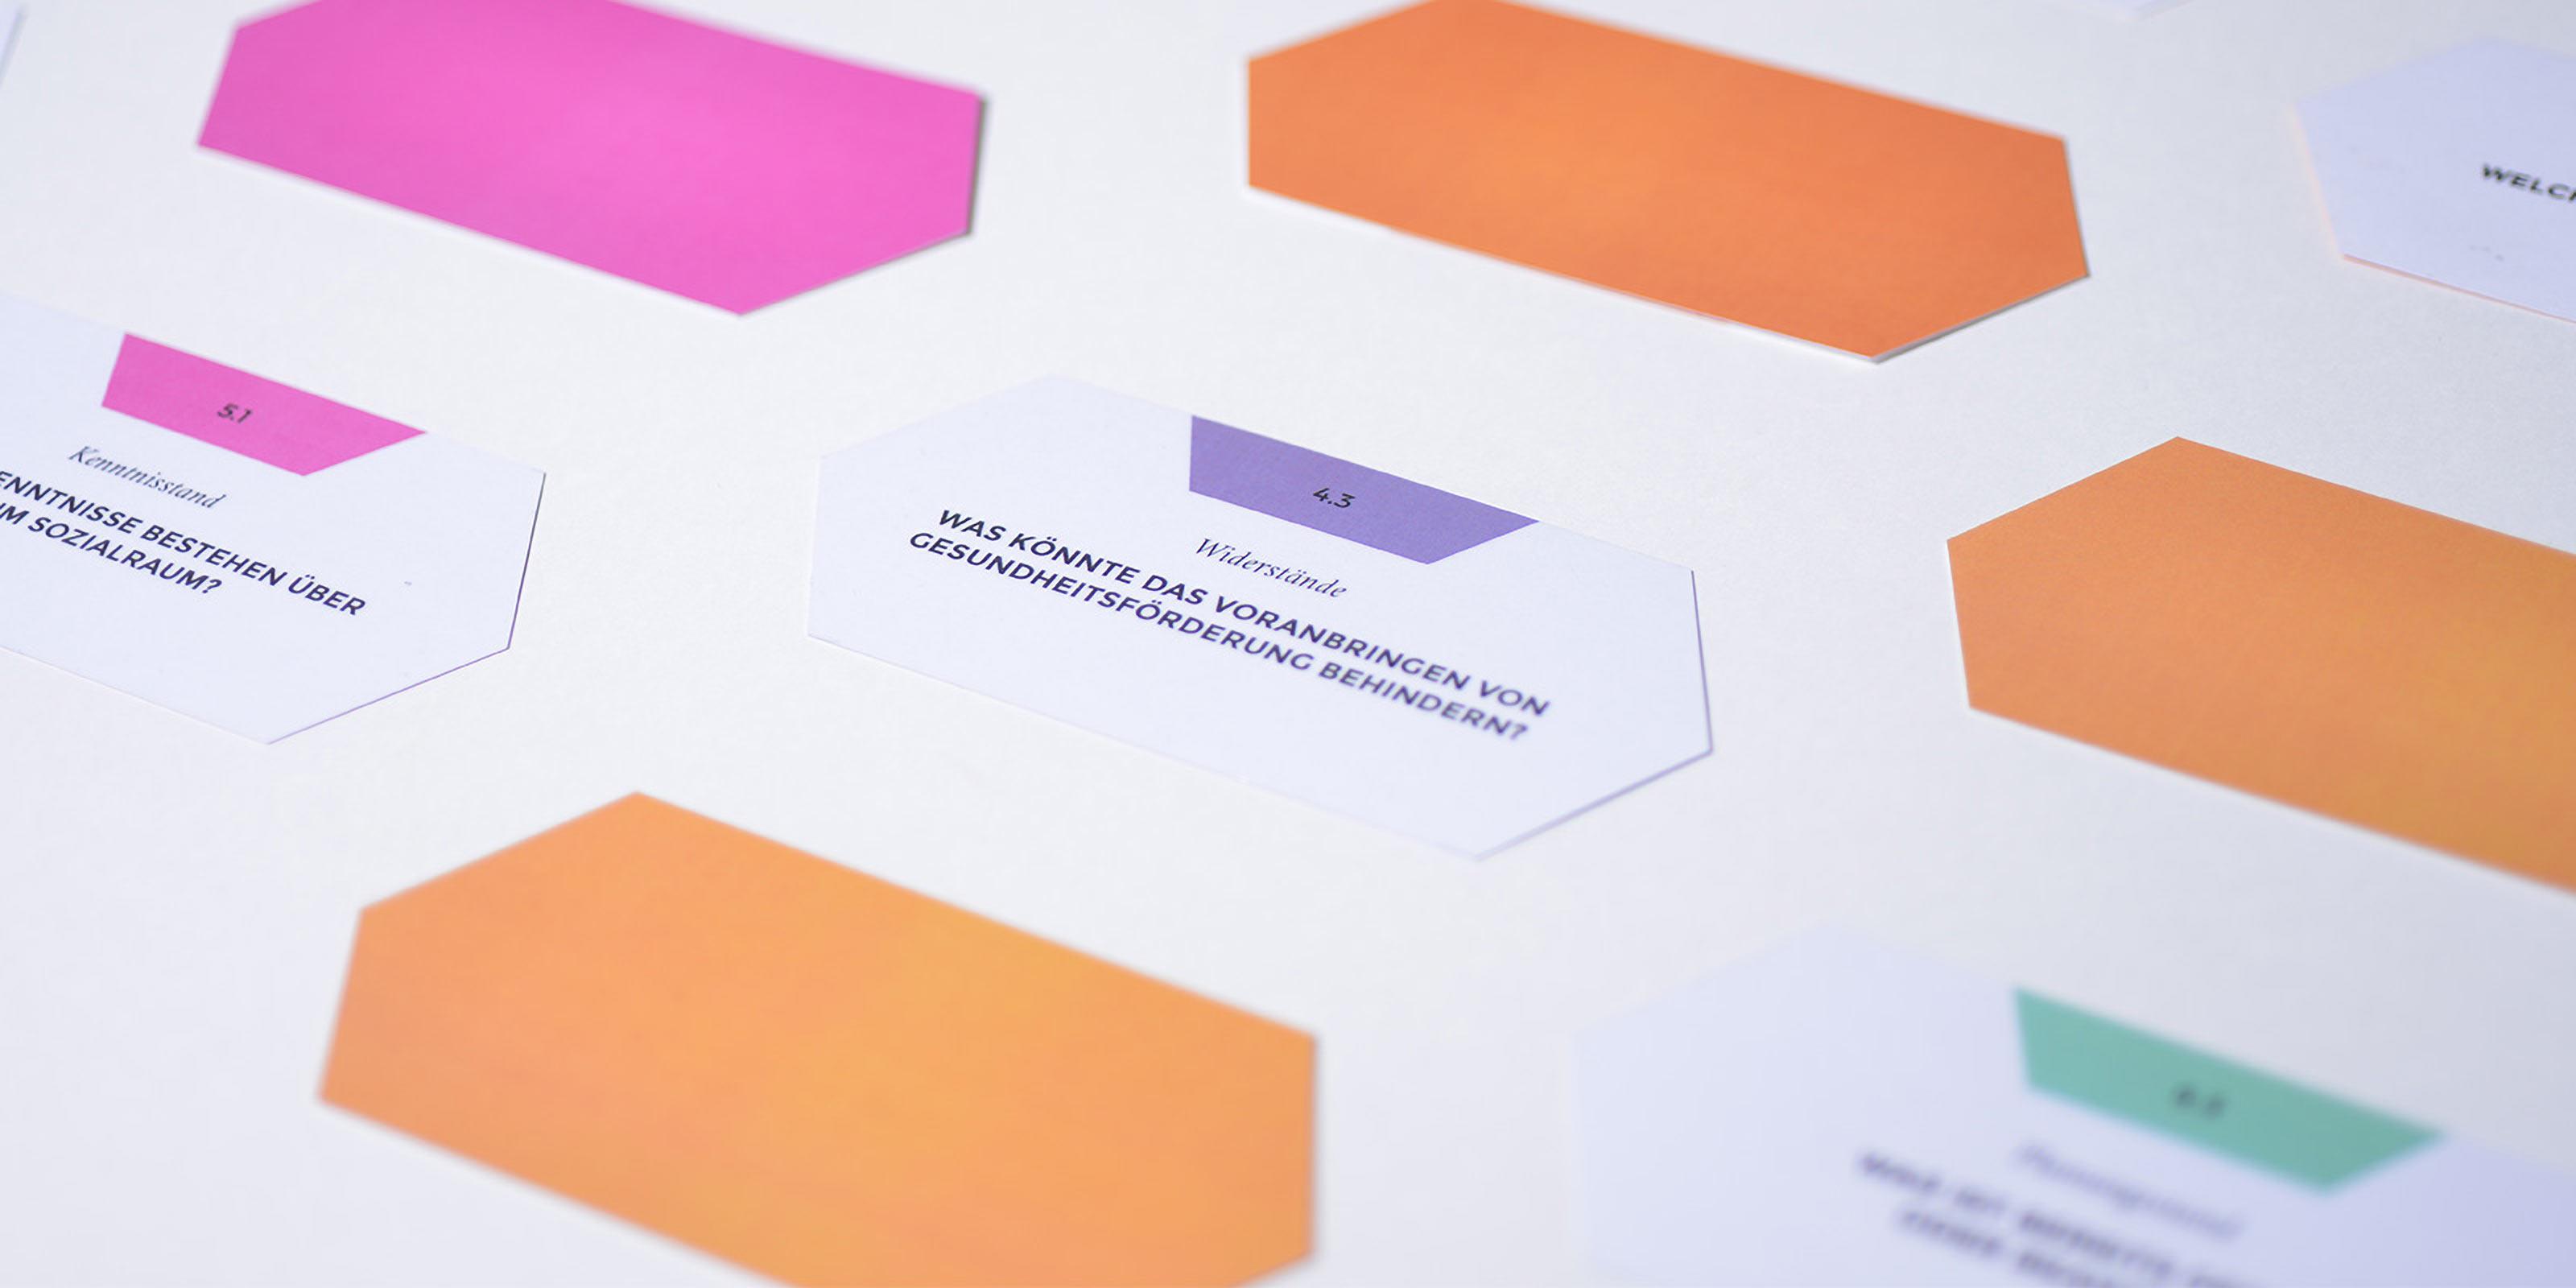 Corporate Design, Hochschule Esslingen, Tool Entwicklung, Print Design, Fragekarten